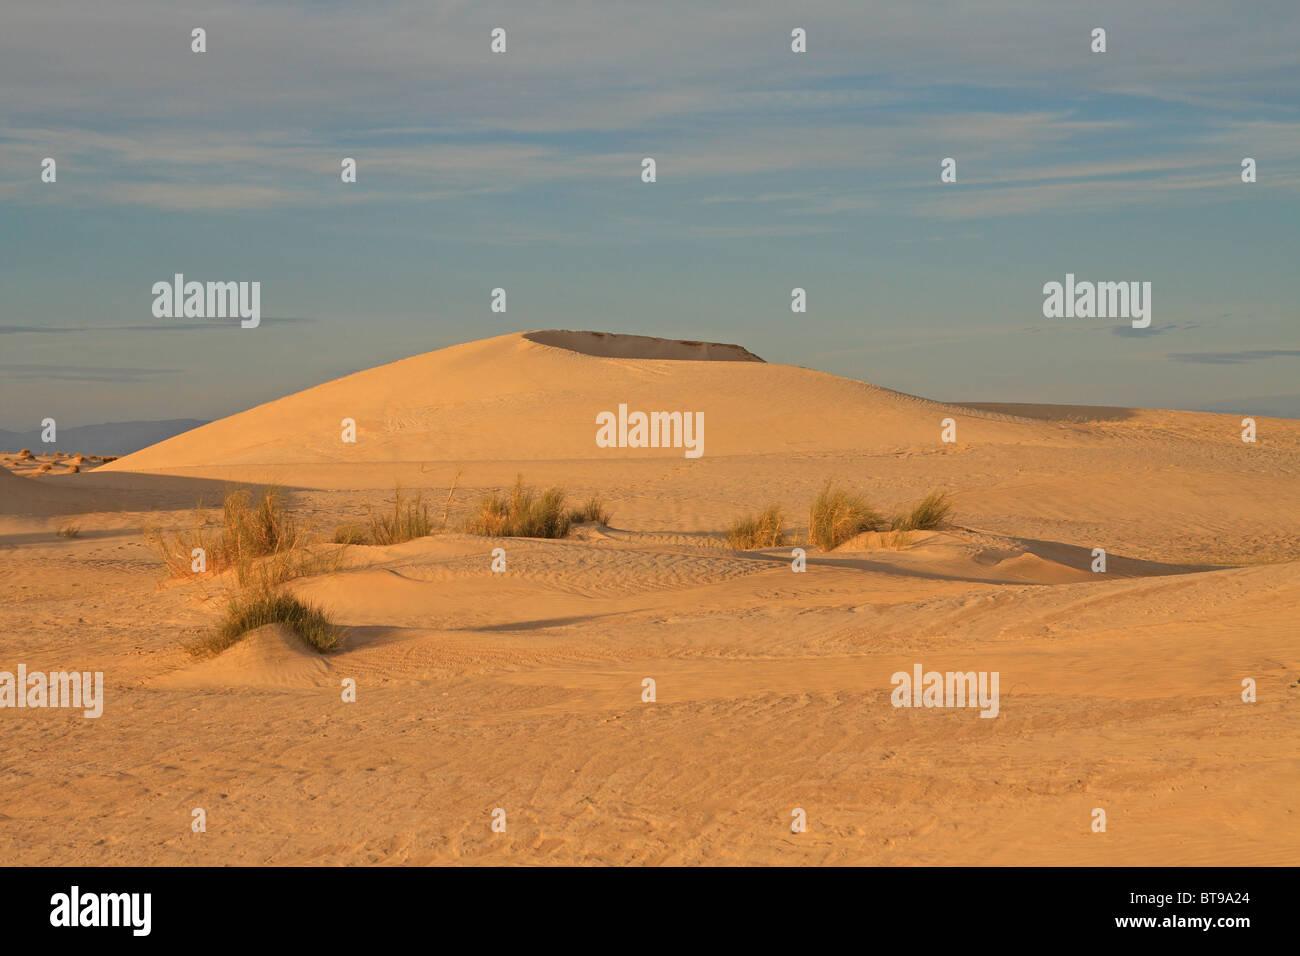 Sand dunes in the Sahara Desert, near Tozeur, western Tunisia - Stock Image